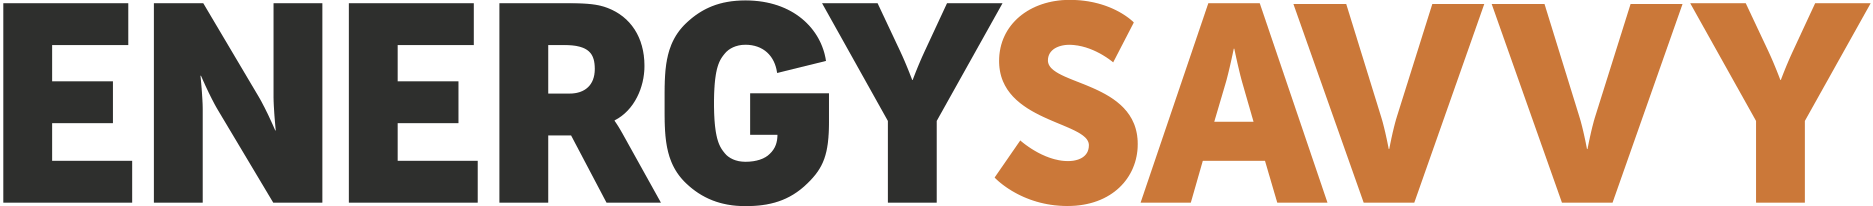 energysavvy_logo.png